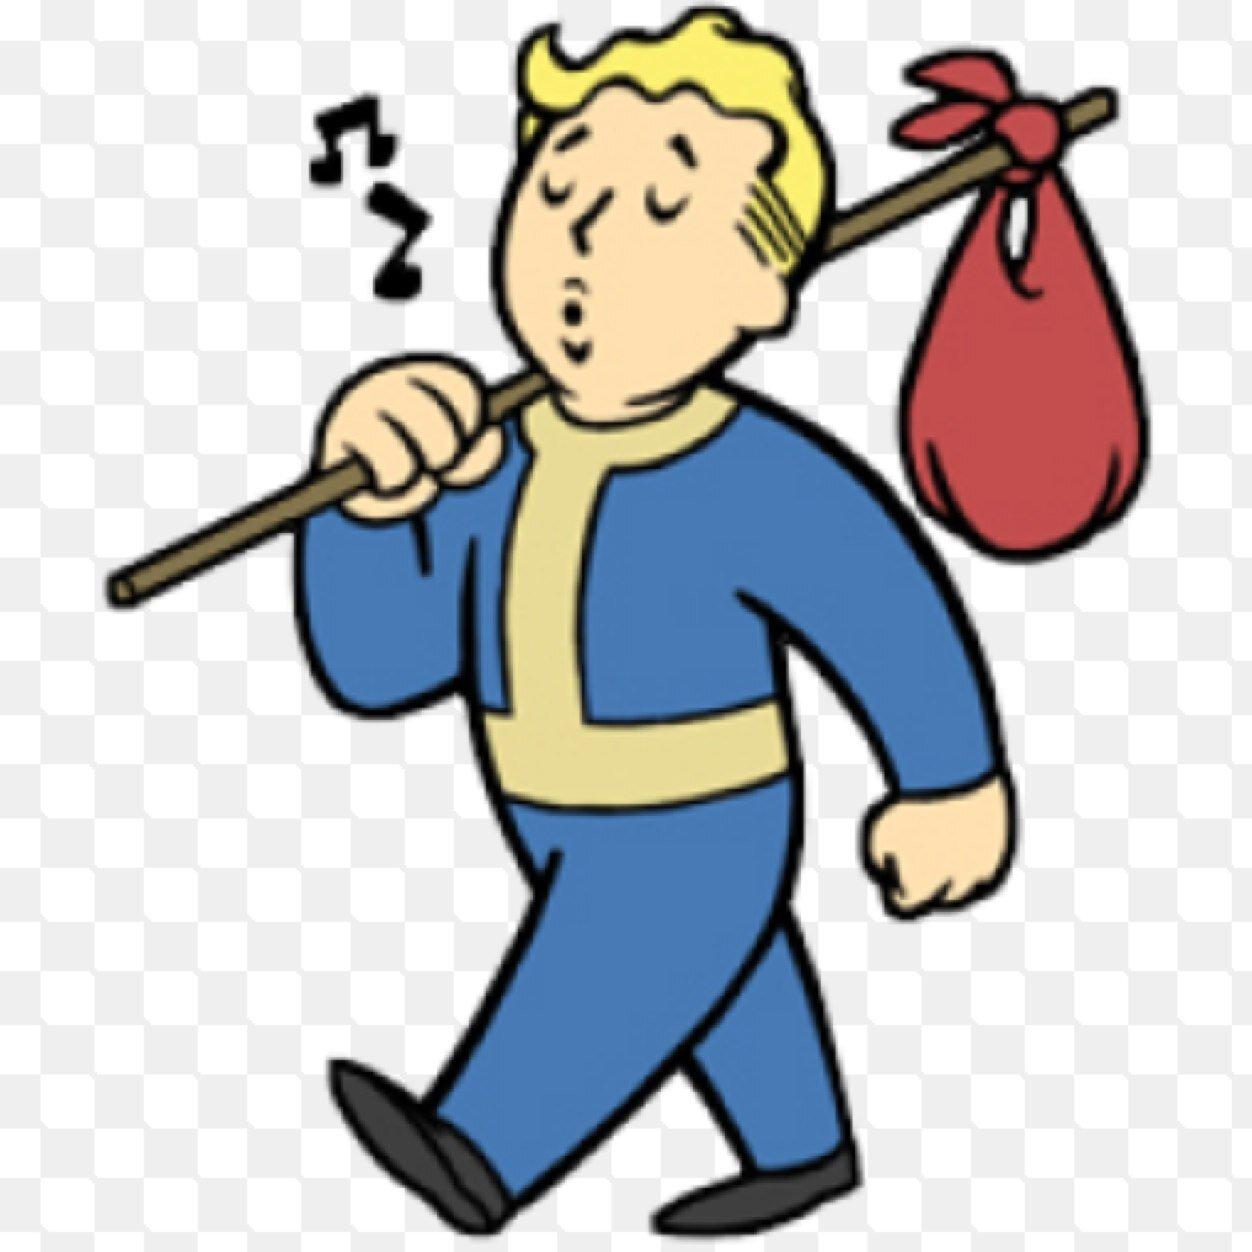 Boy Avatar: Fallout Flashbacks (@Falloutwastaken)